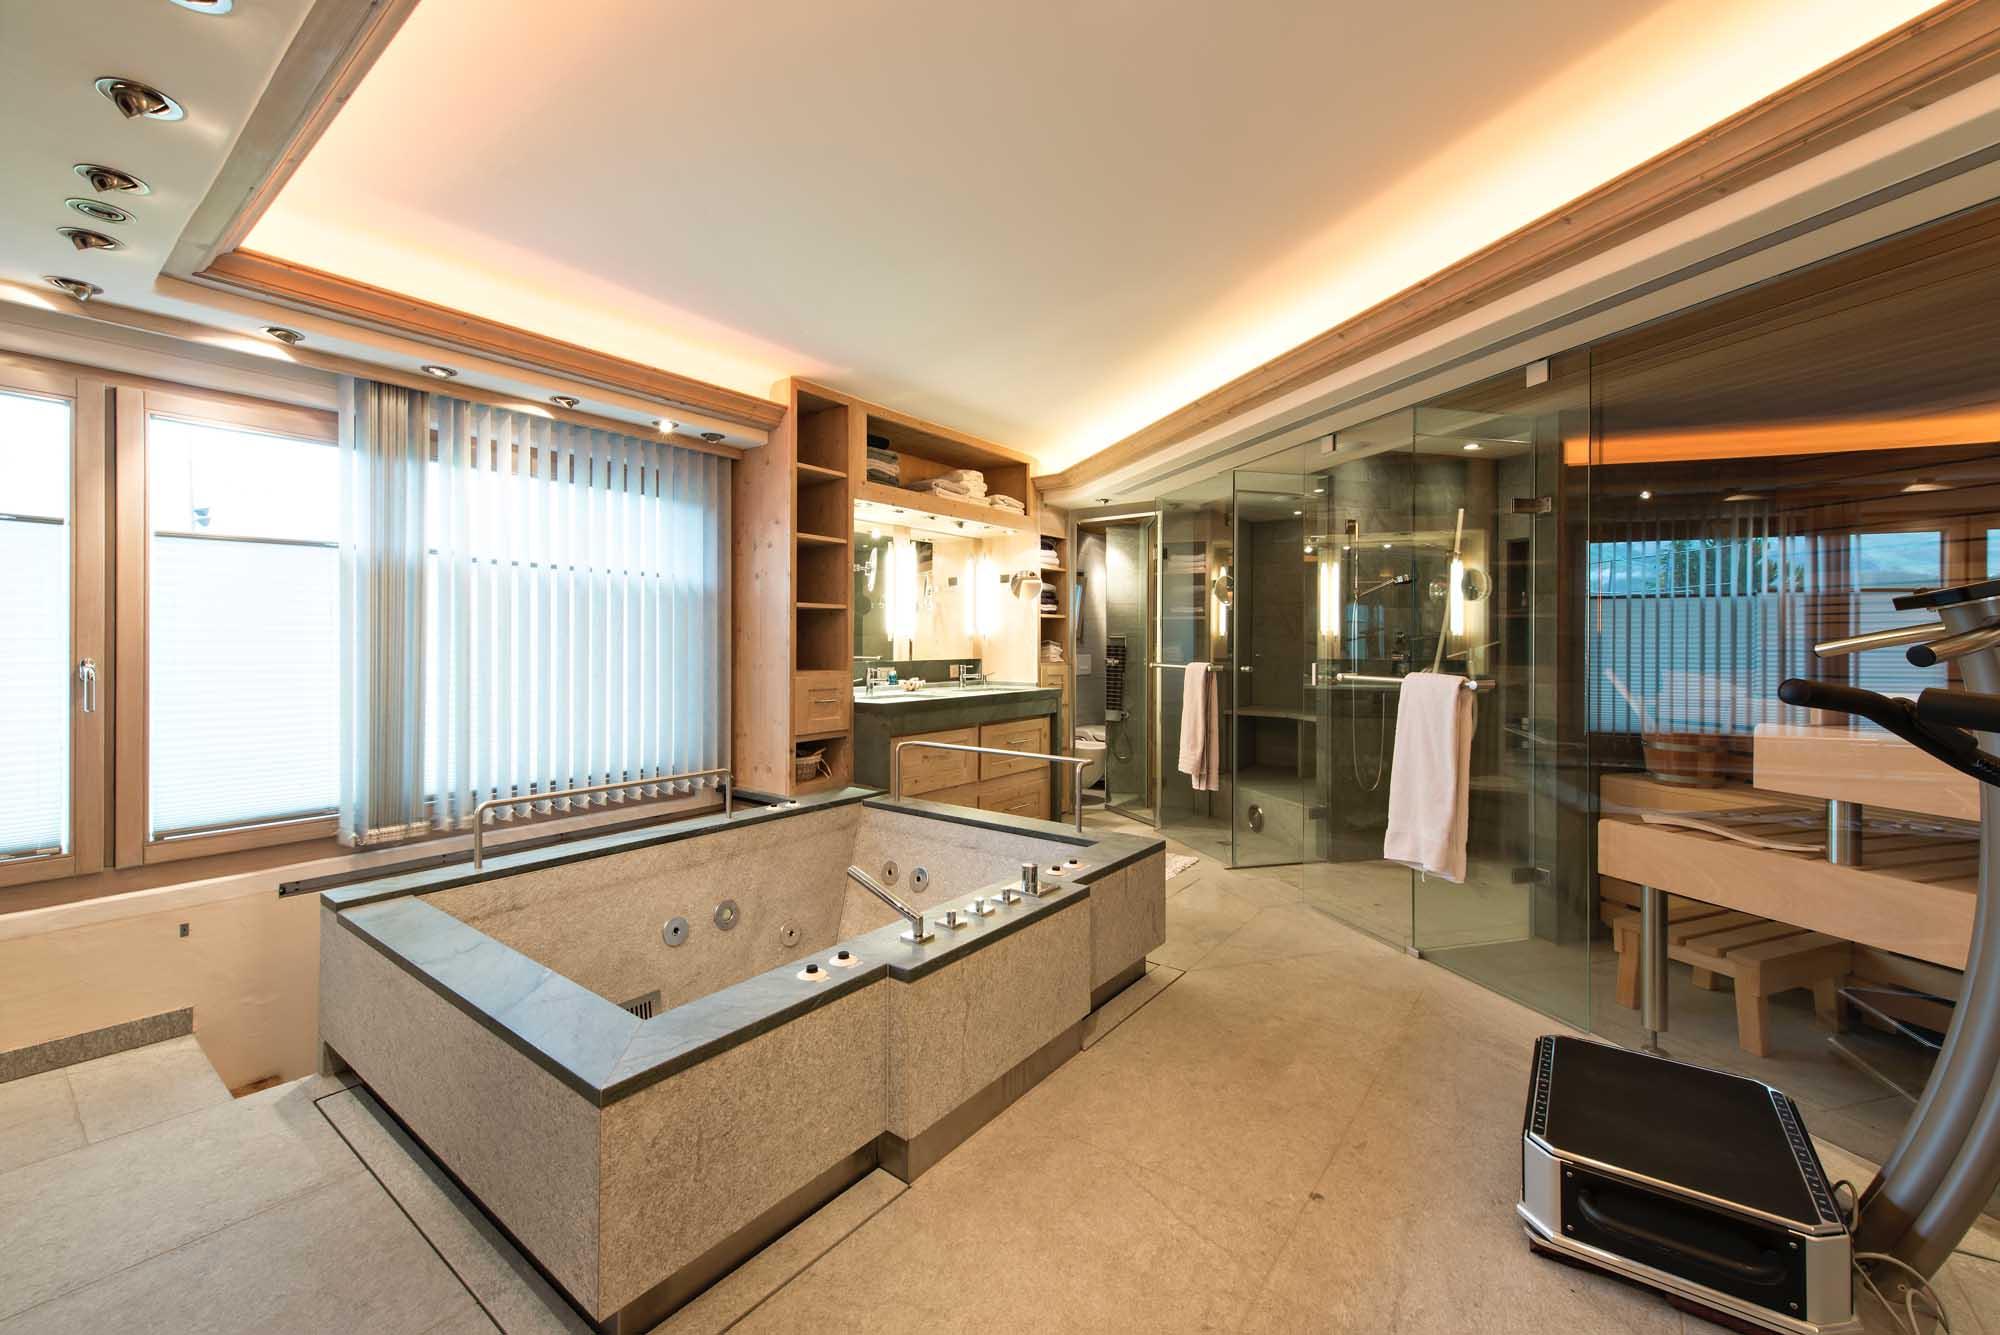 Awesome Modernes Design Spa Hotel Gallery House Design Ideas Spa Und ...